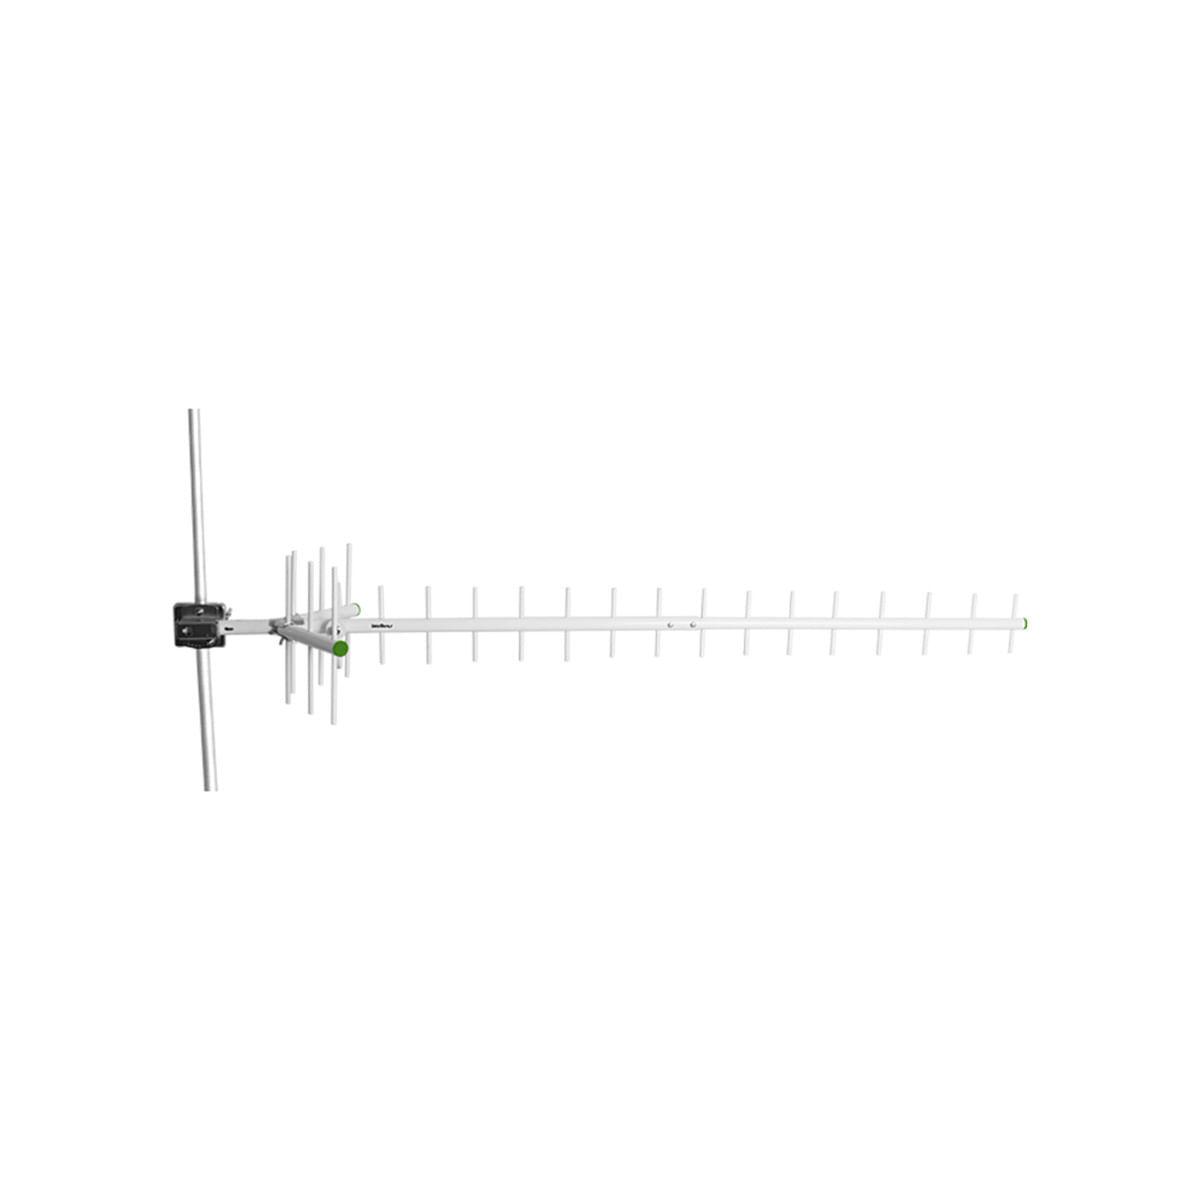 Kit Telefone Celular Fixo 3G Intelbras CFA 6041 + Antena